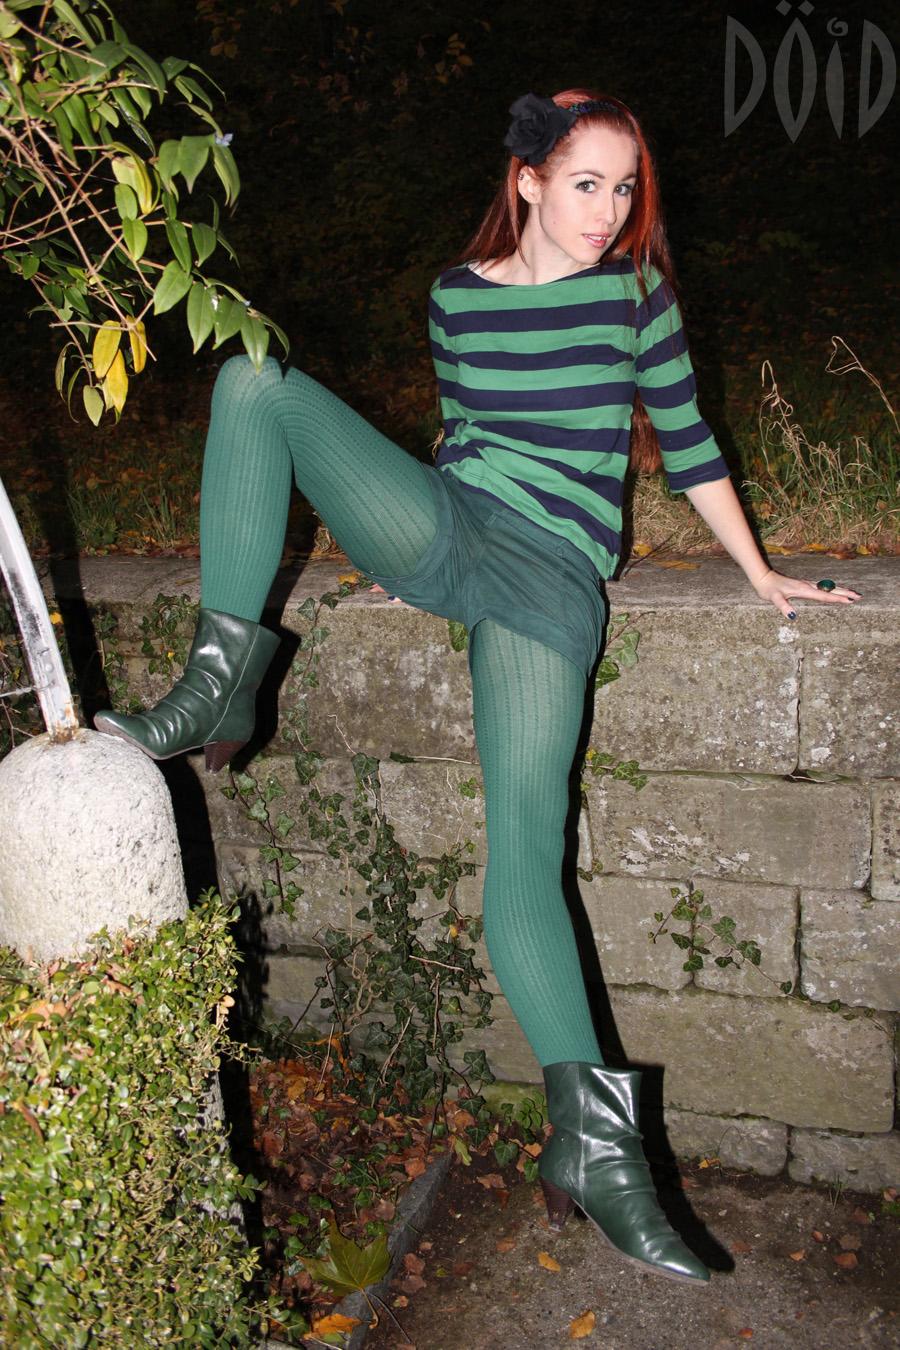 Teen in strumpfhose